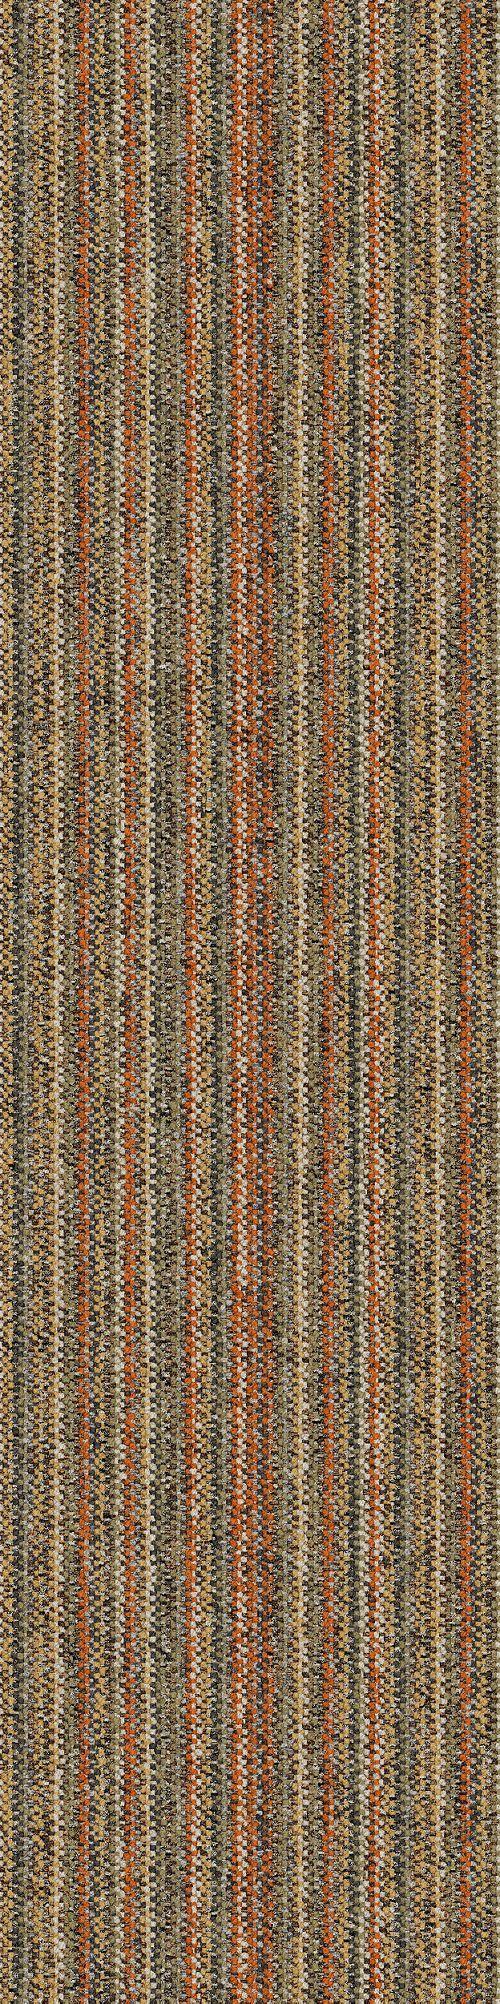 112 best interface world woven images on pinterest carpets interface carpet tile ww865 color name moorland warp variant 1 baanklon Gallery